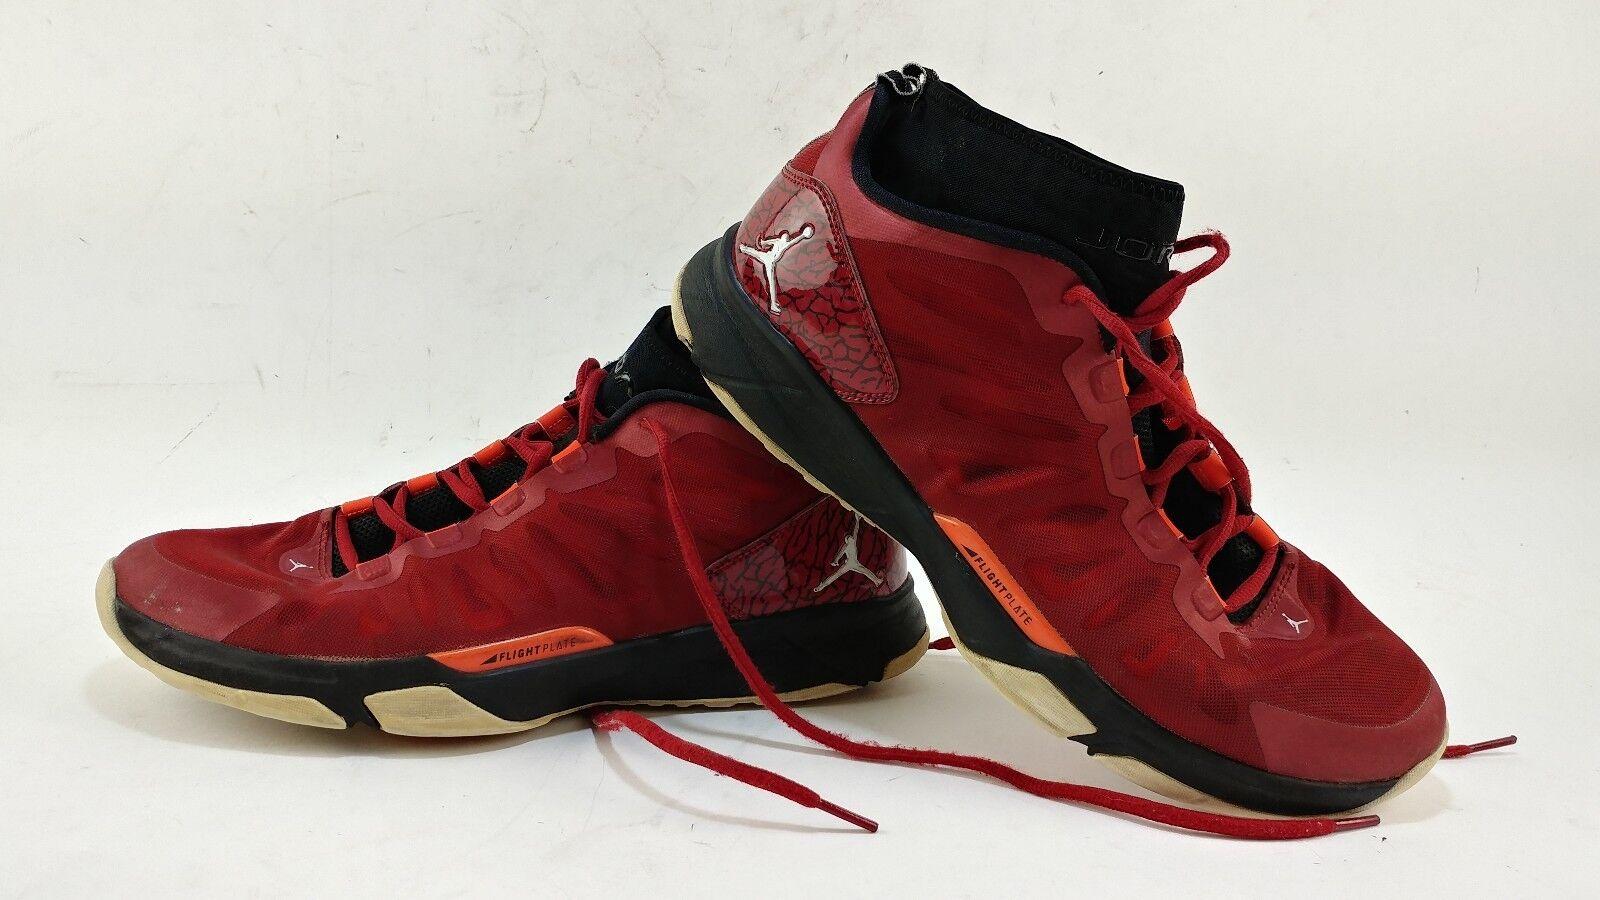 Jordan Dominate Pro Gym Red Total Crimson Basketball shoes Sneaker 580610-607